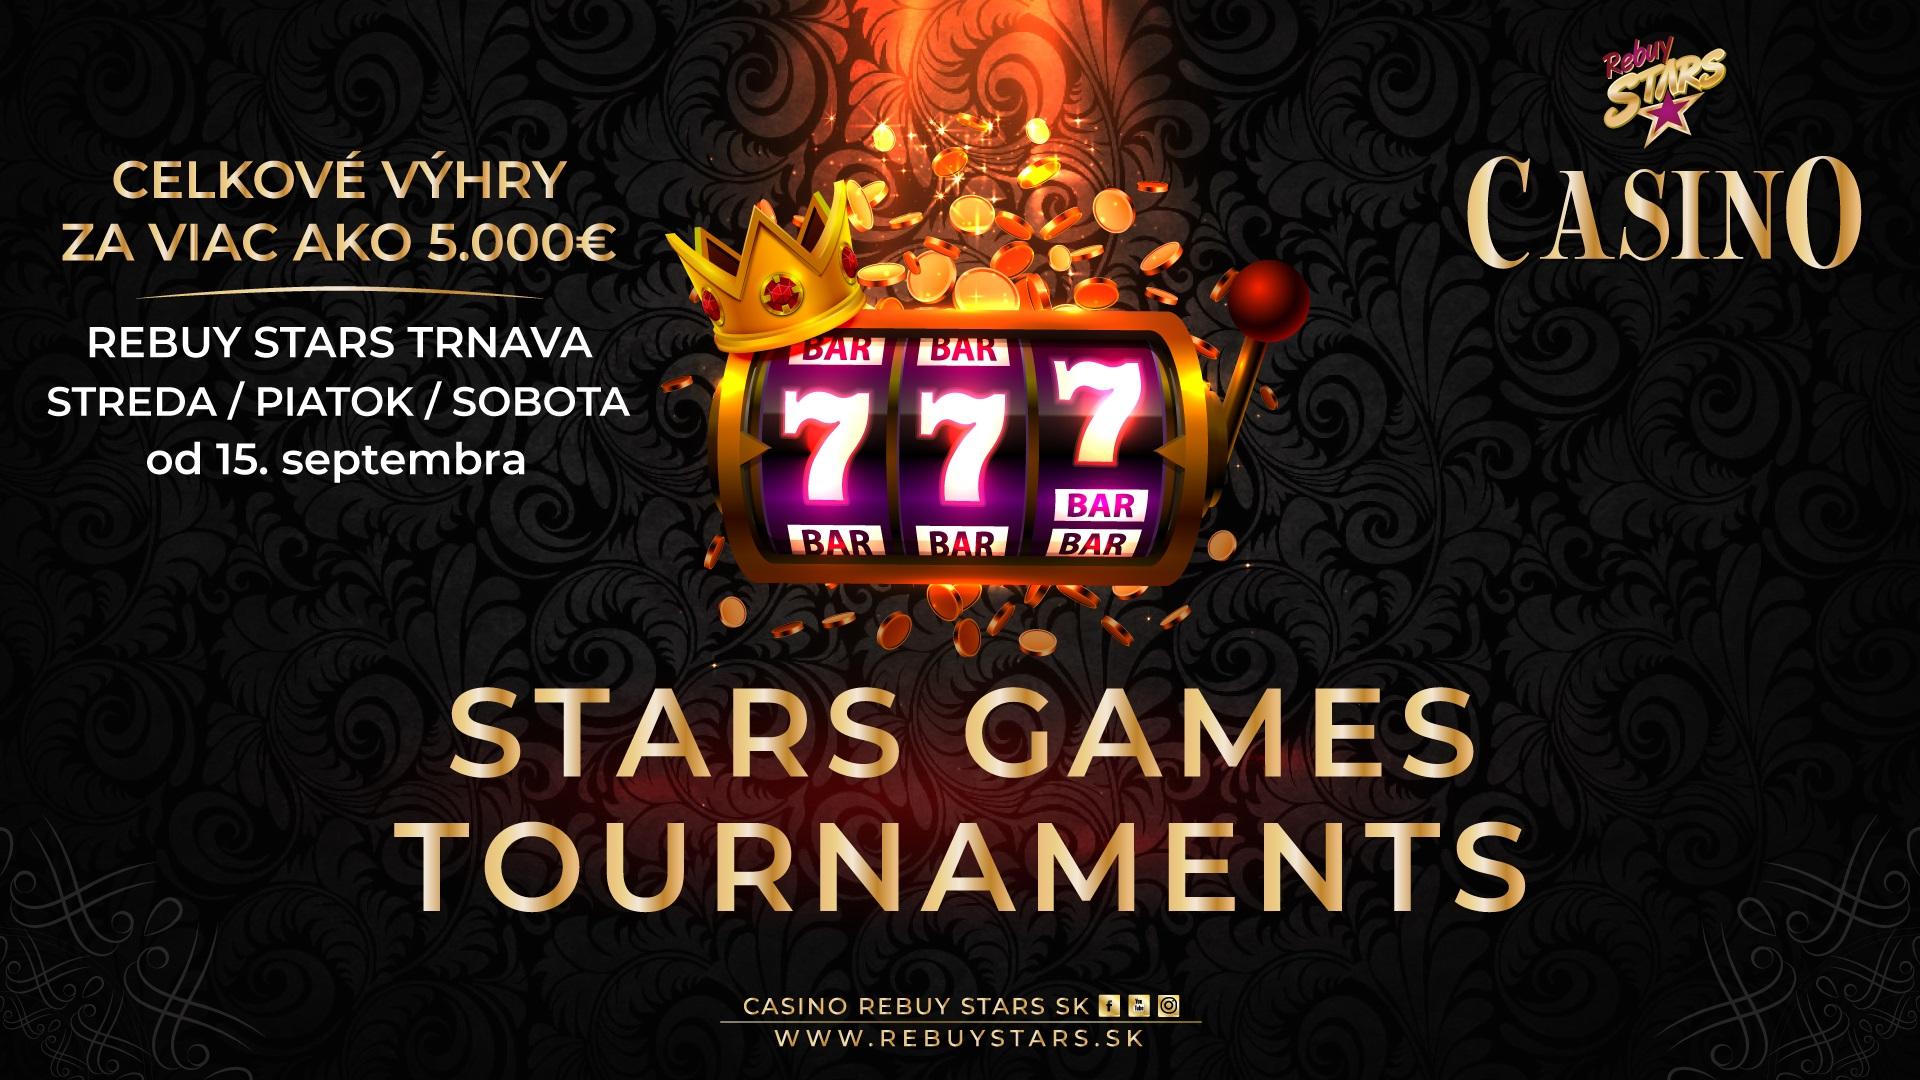 2021_09_01_Stars_Games_Tournaments_1920x1080px